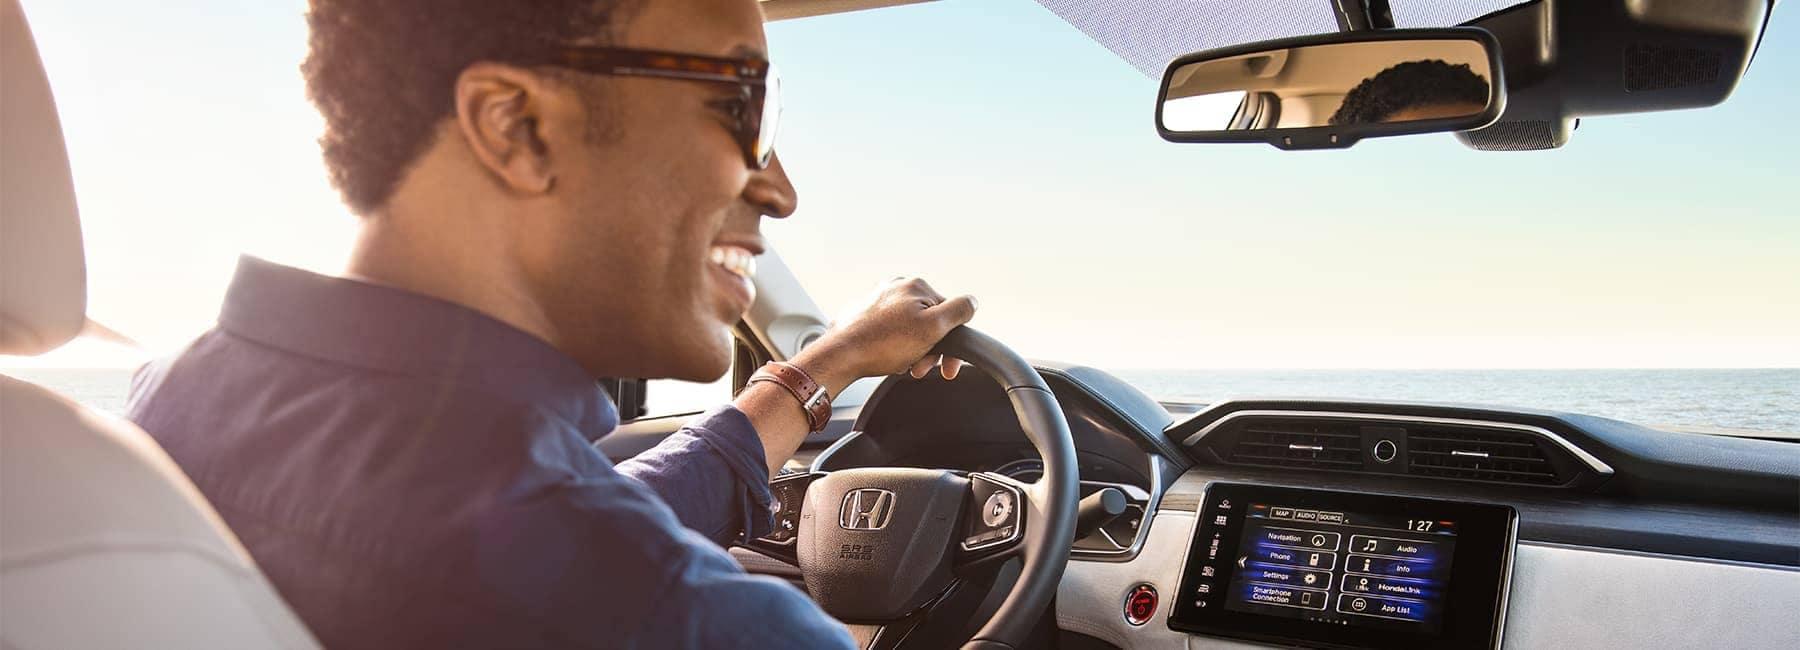 Smiling man drives Honda Clarity